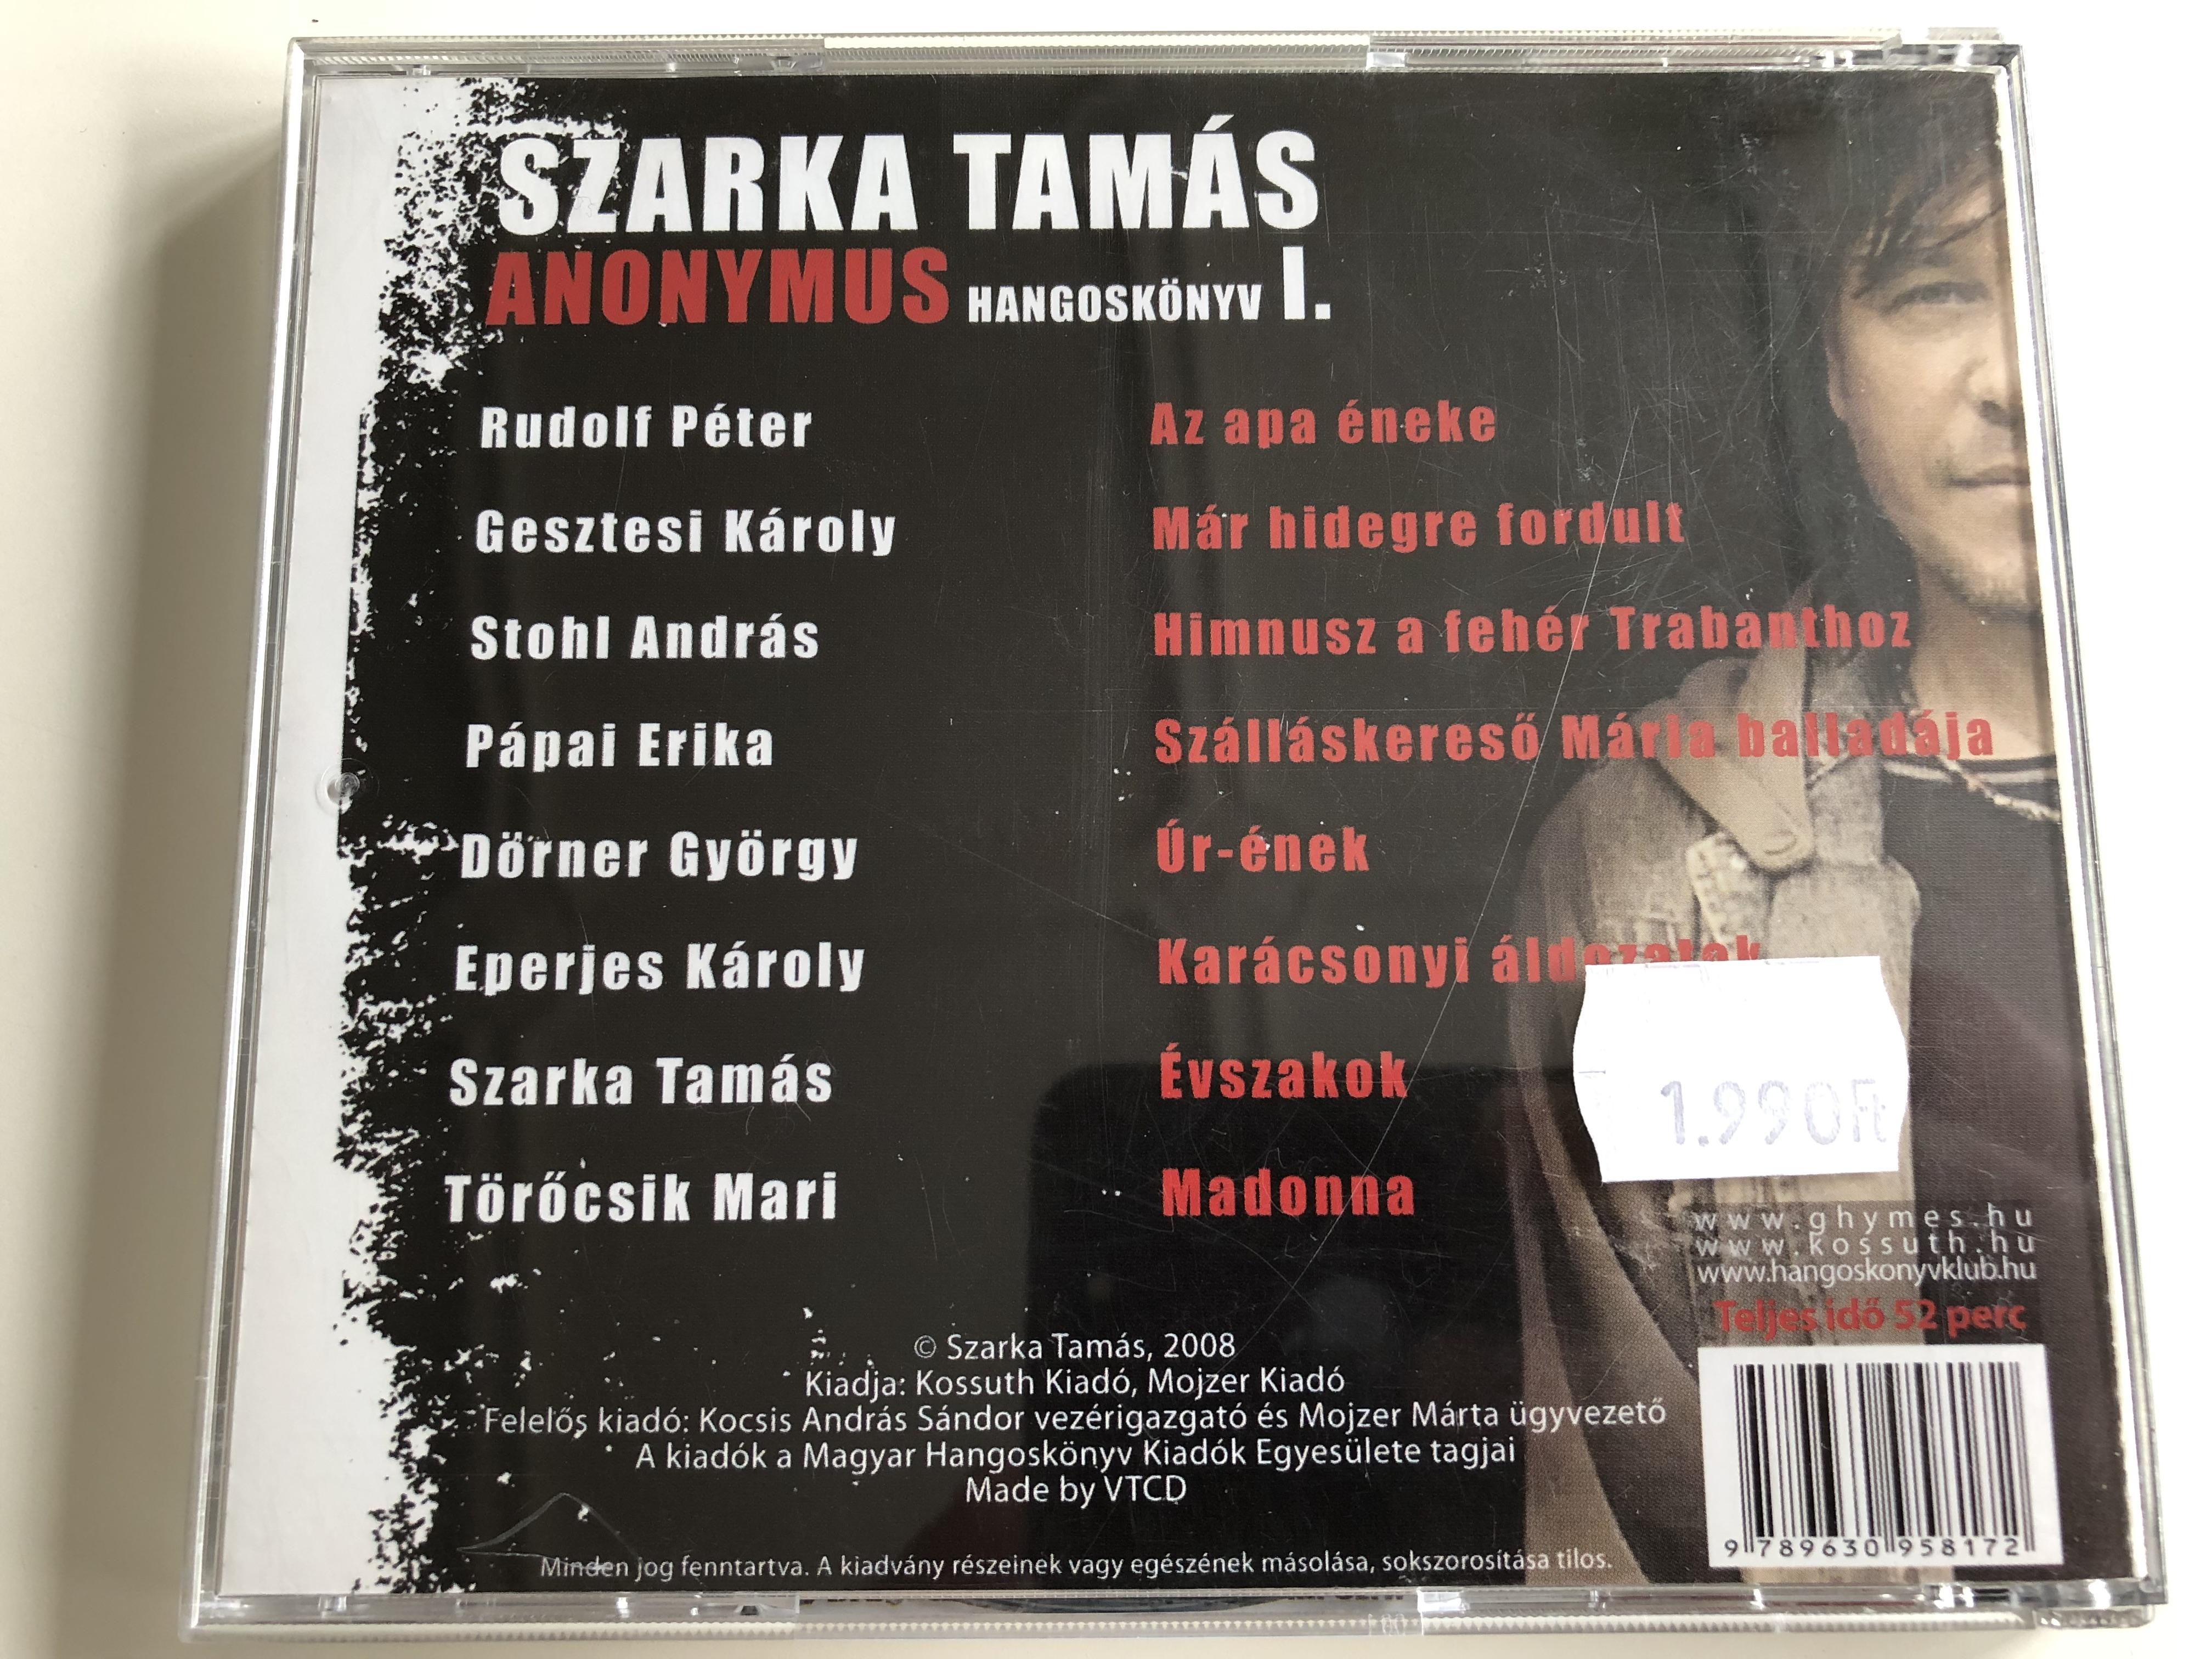 szarka-tam-s-anonymus-hangosk-nyv-i.-audio-book-contributors-d-rner-gy-rgy-eperjes-k-roly-gesztesi-k-roly-p-pai-erika-rudolf-p-ter-stohl-andr-s-t-r-csik-mari-audio-cd-2008-kossuth-mojzer-4-.jpg